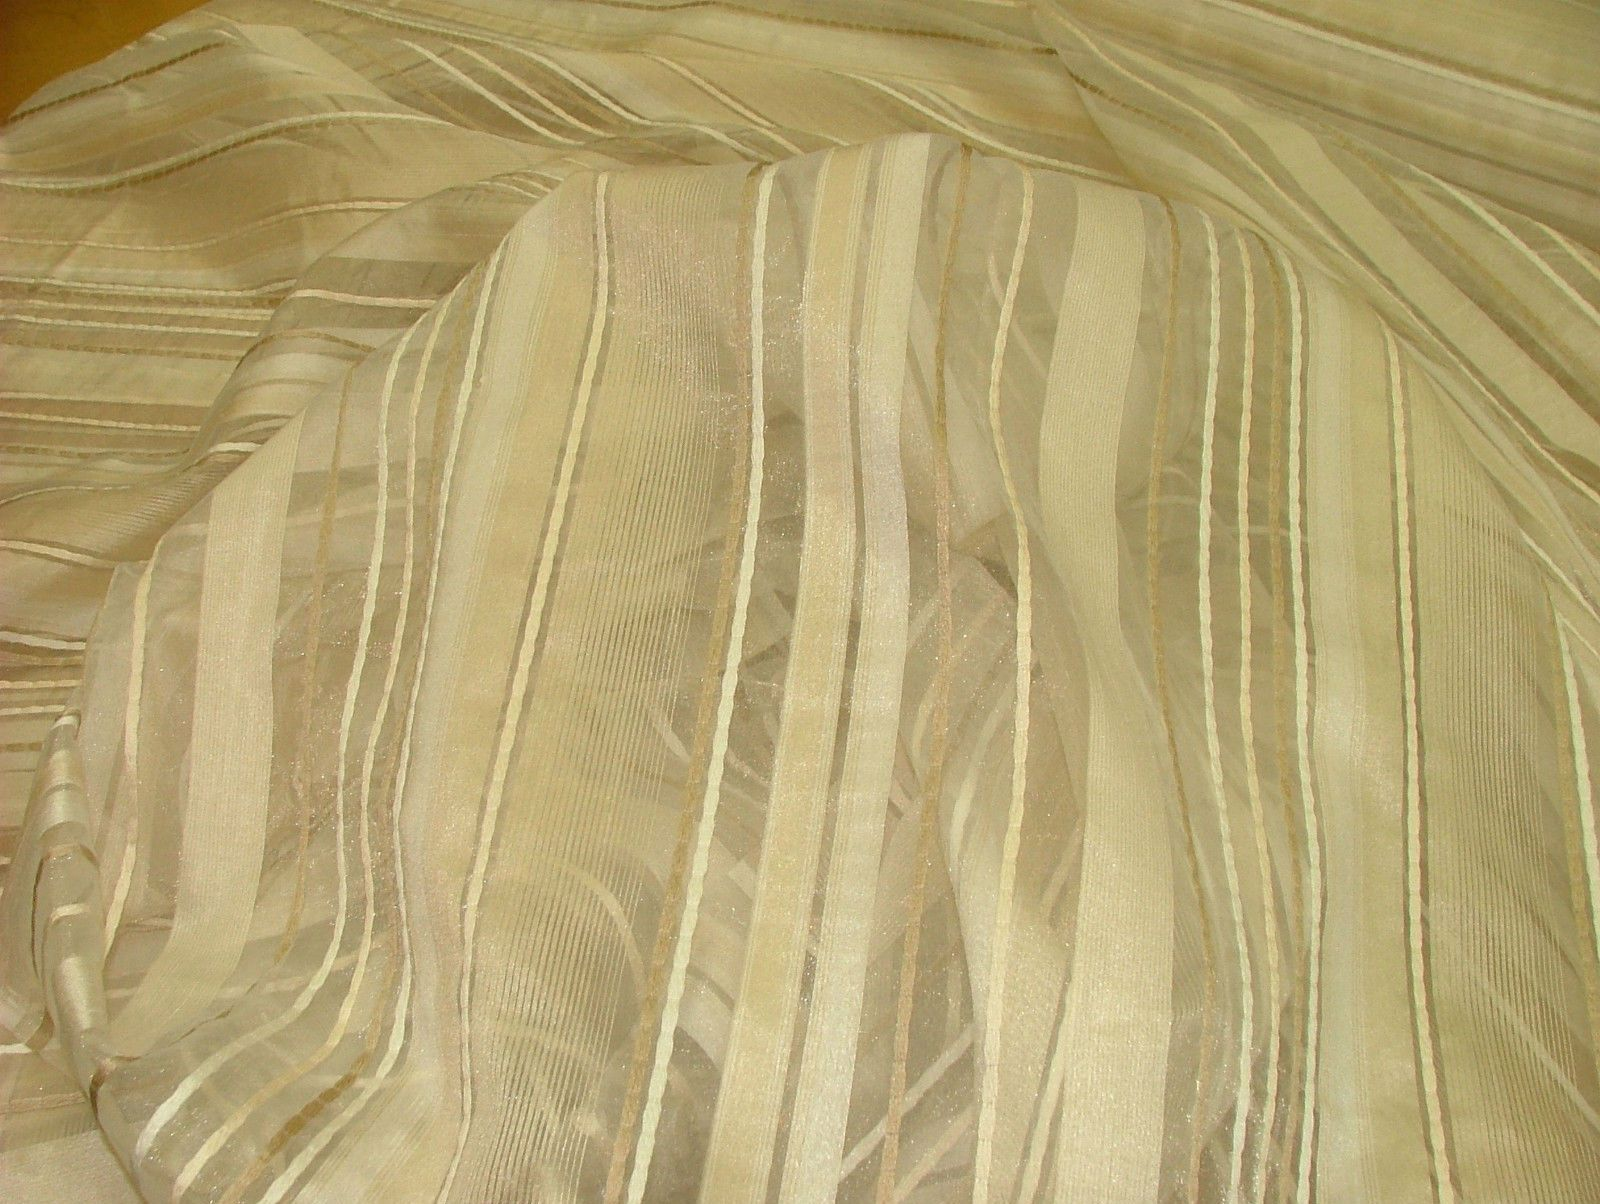 Ashley wilde ashby cream voile organza curtain window for Ashby windows